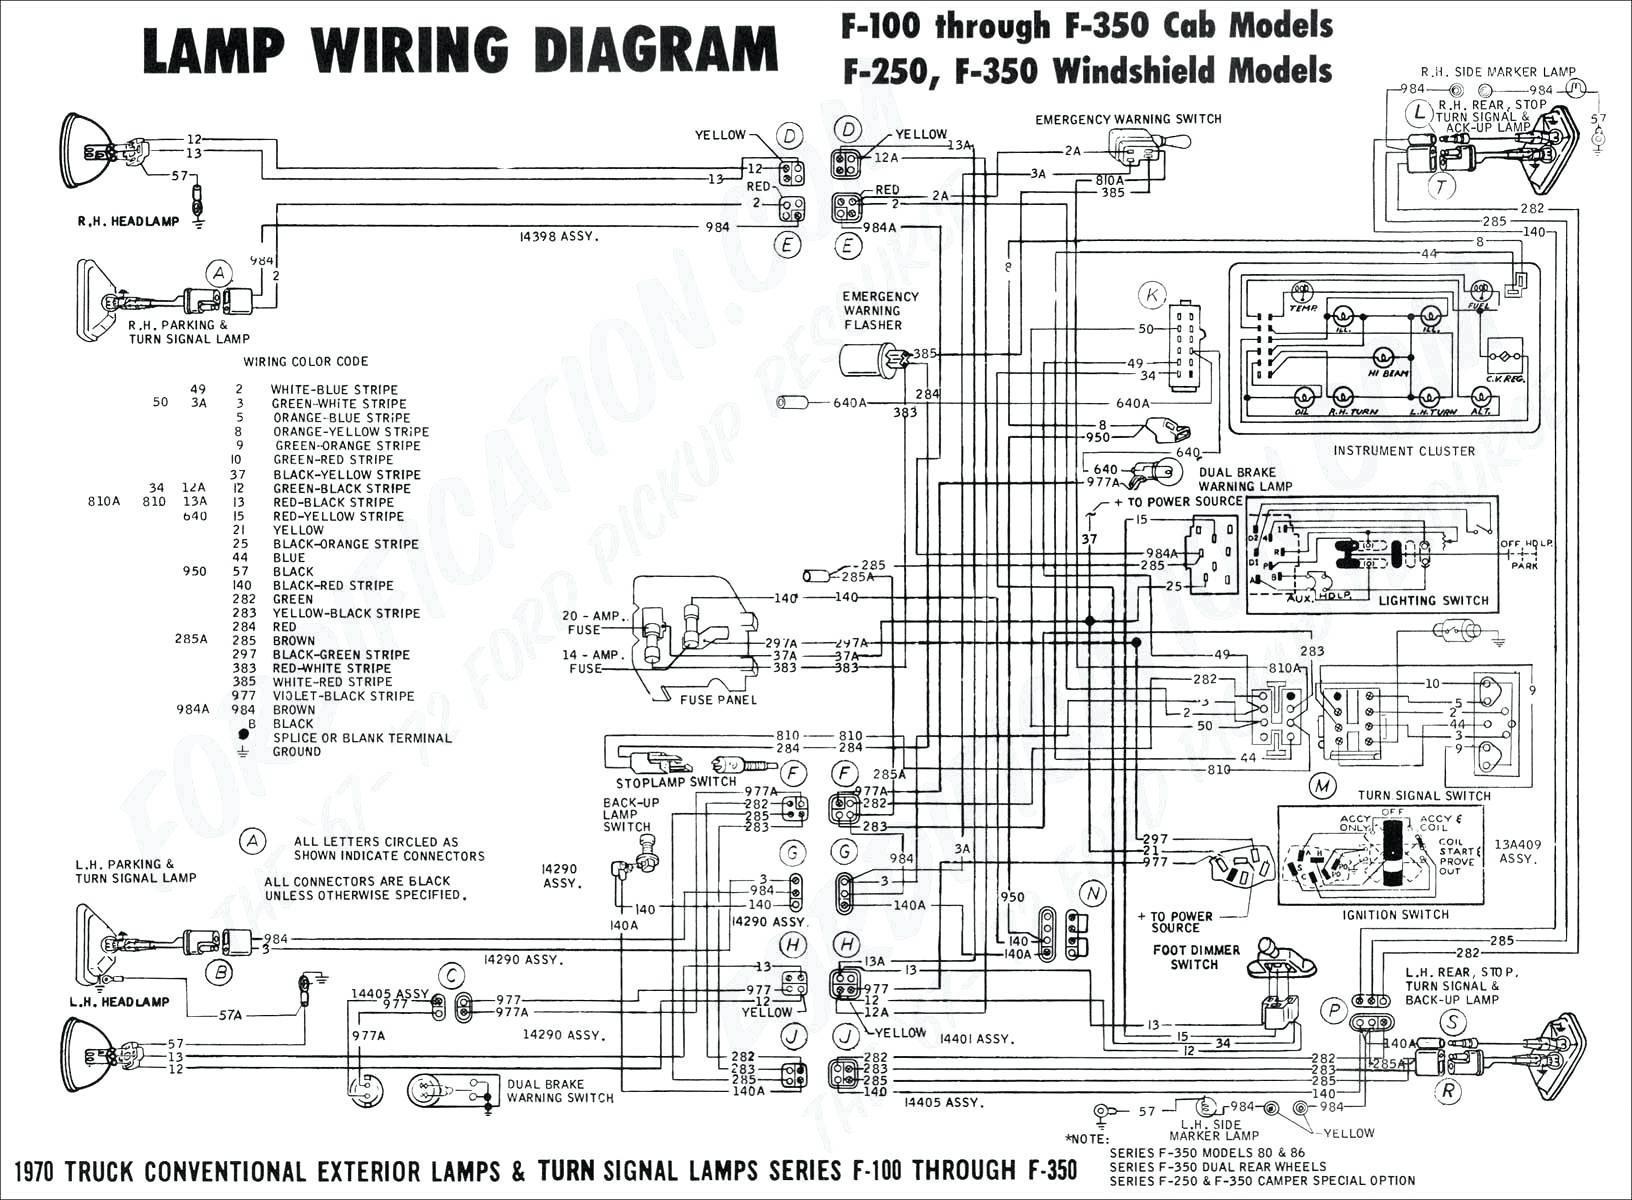 Diagram Of A Lawn Mower Engine 03 Audi A4 Fuse Box Diagram Wiring Diagram toolbox Of Diagram Of A Lawn Mower Engine